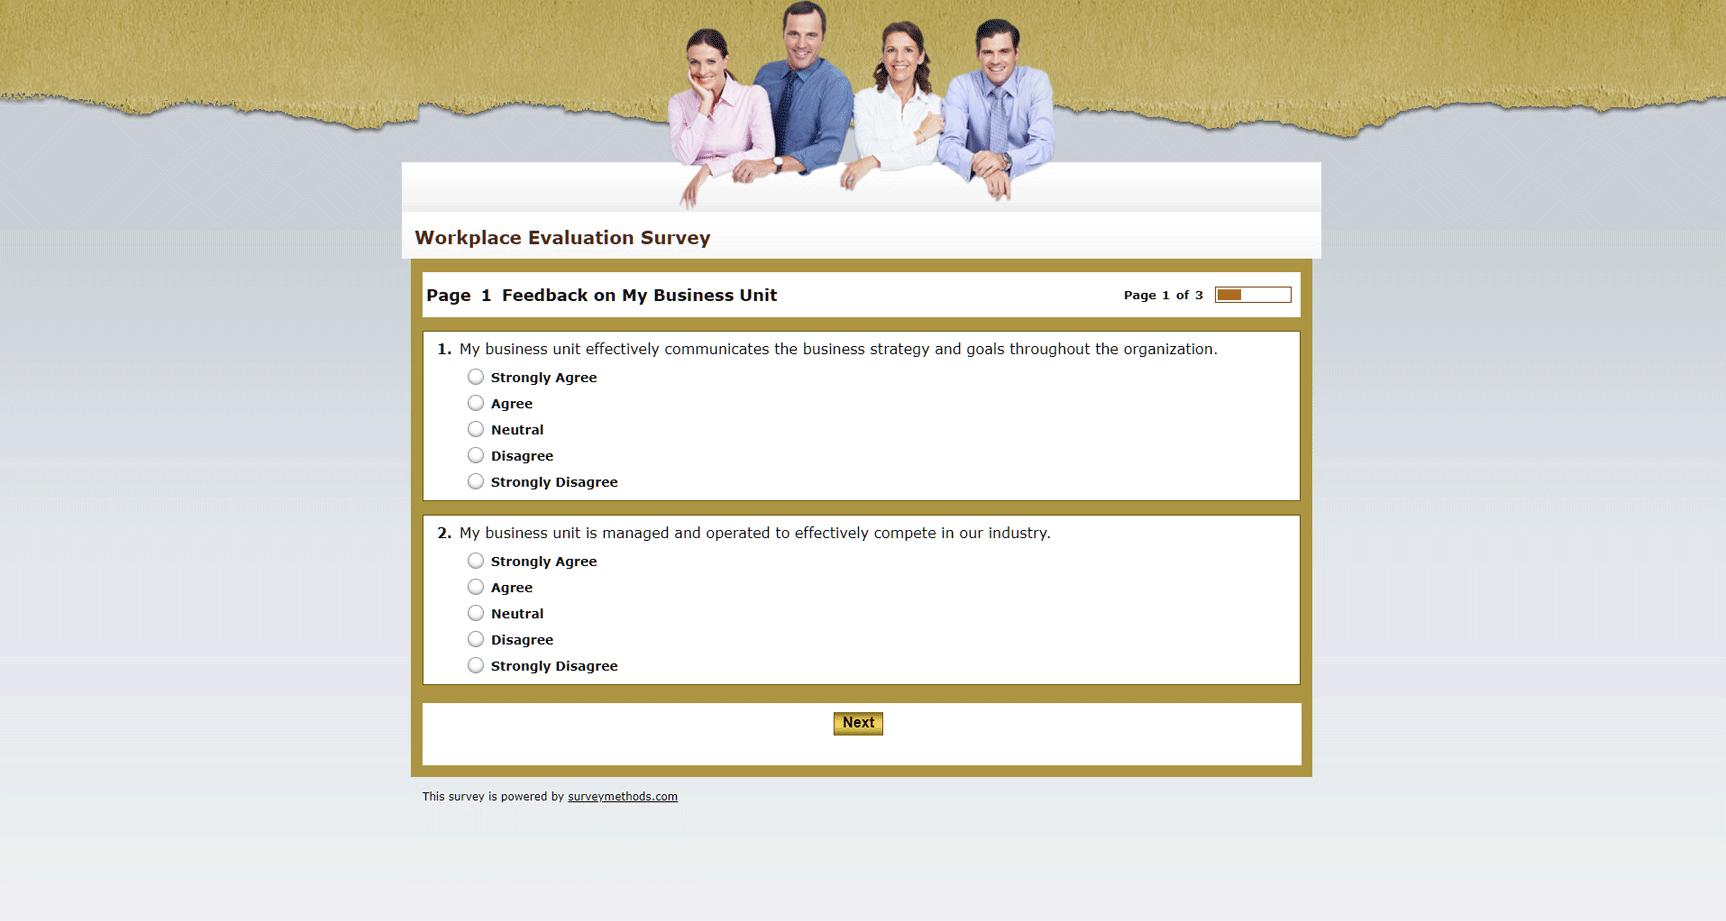 Workplace Evaluation Survey